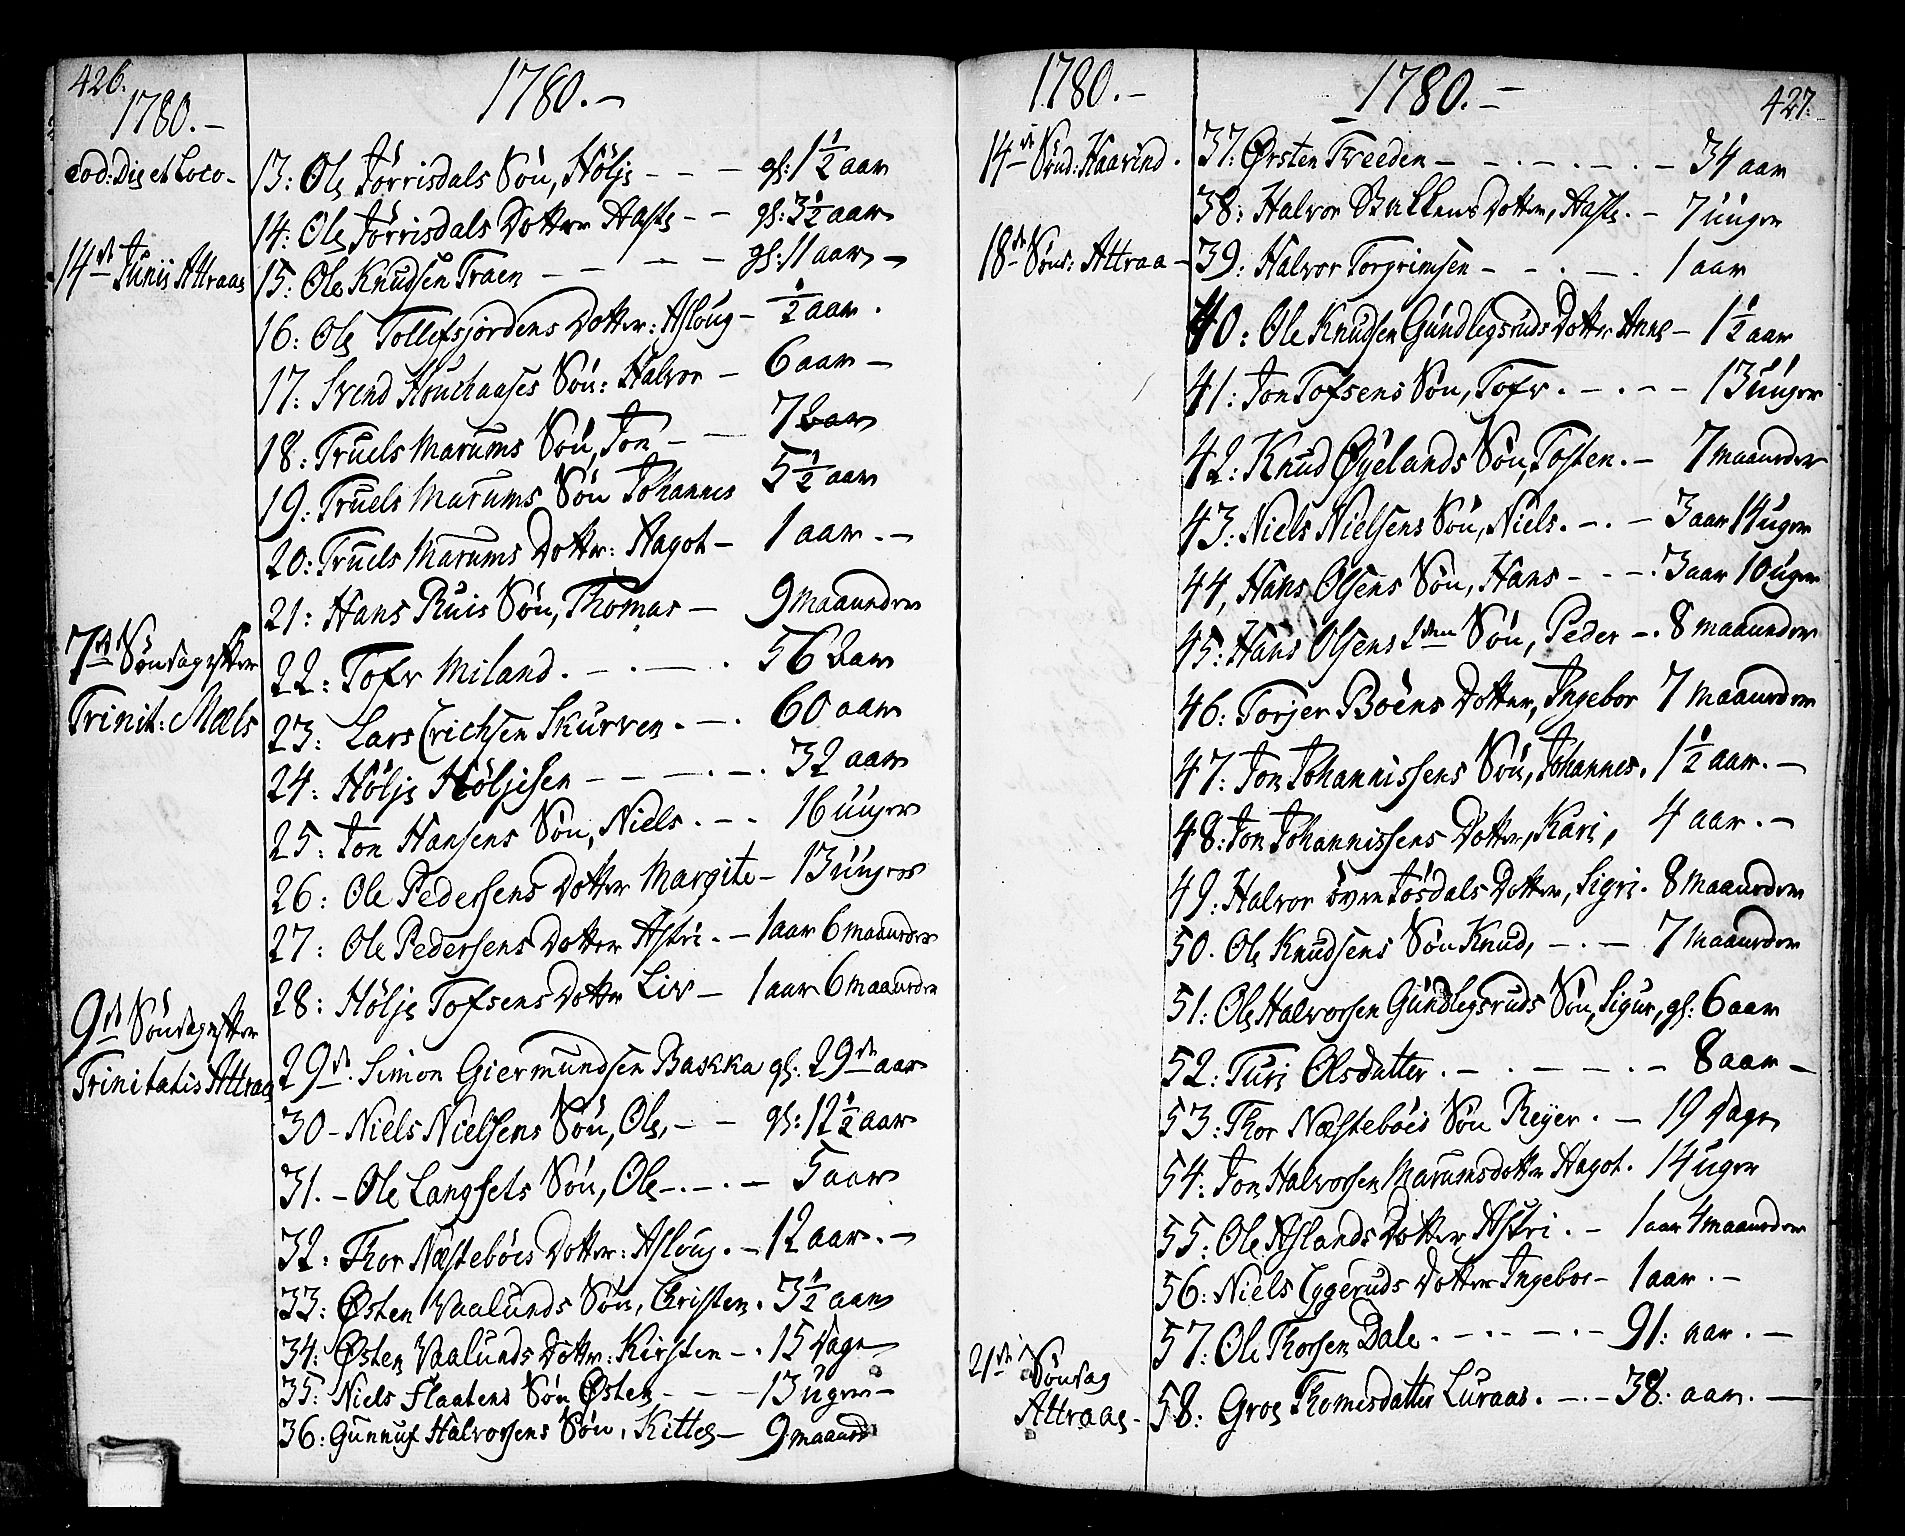 SAKO, Tinn kirkebøker, F/Fa/L0002: Ministerialbok nr. I 2, 1757-1810, s. 426-427